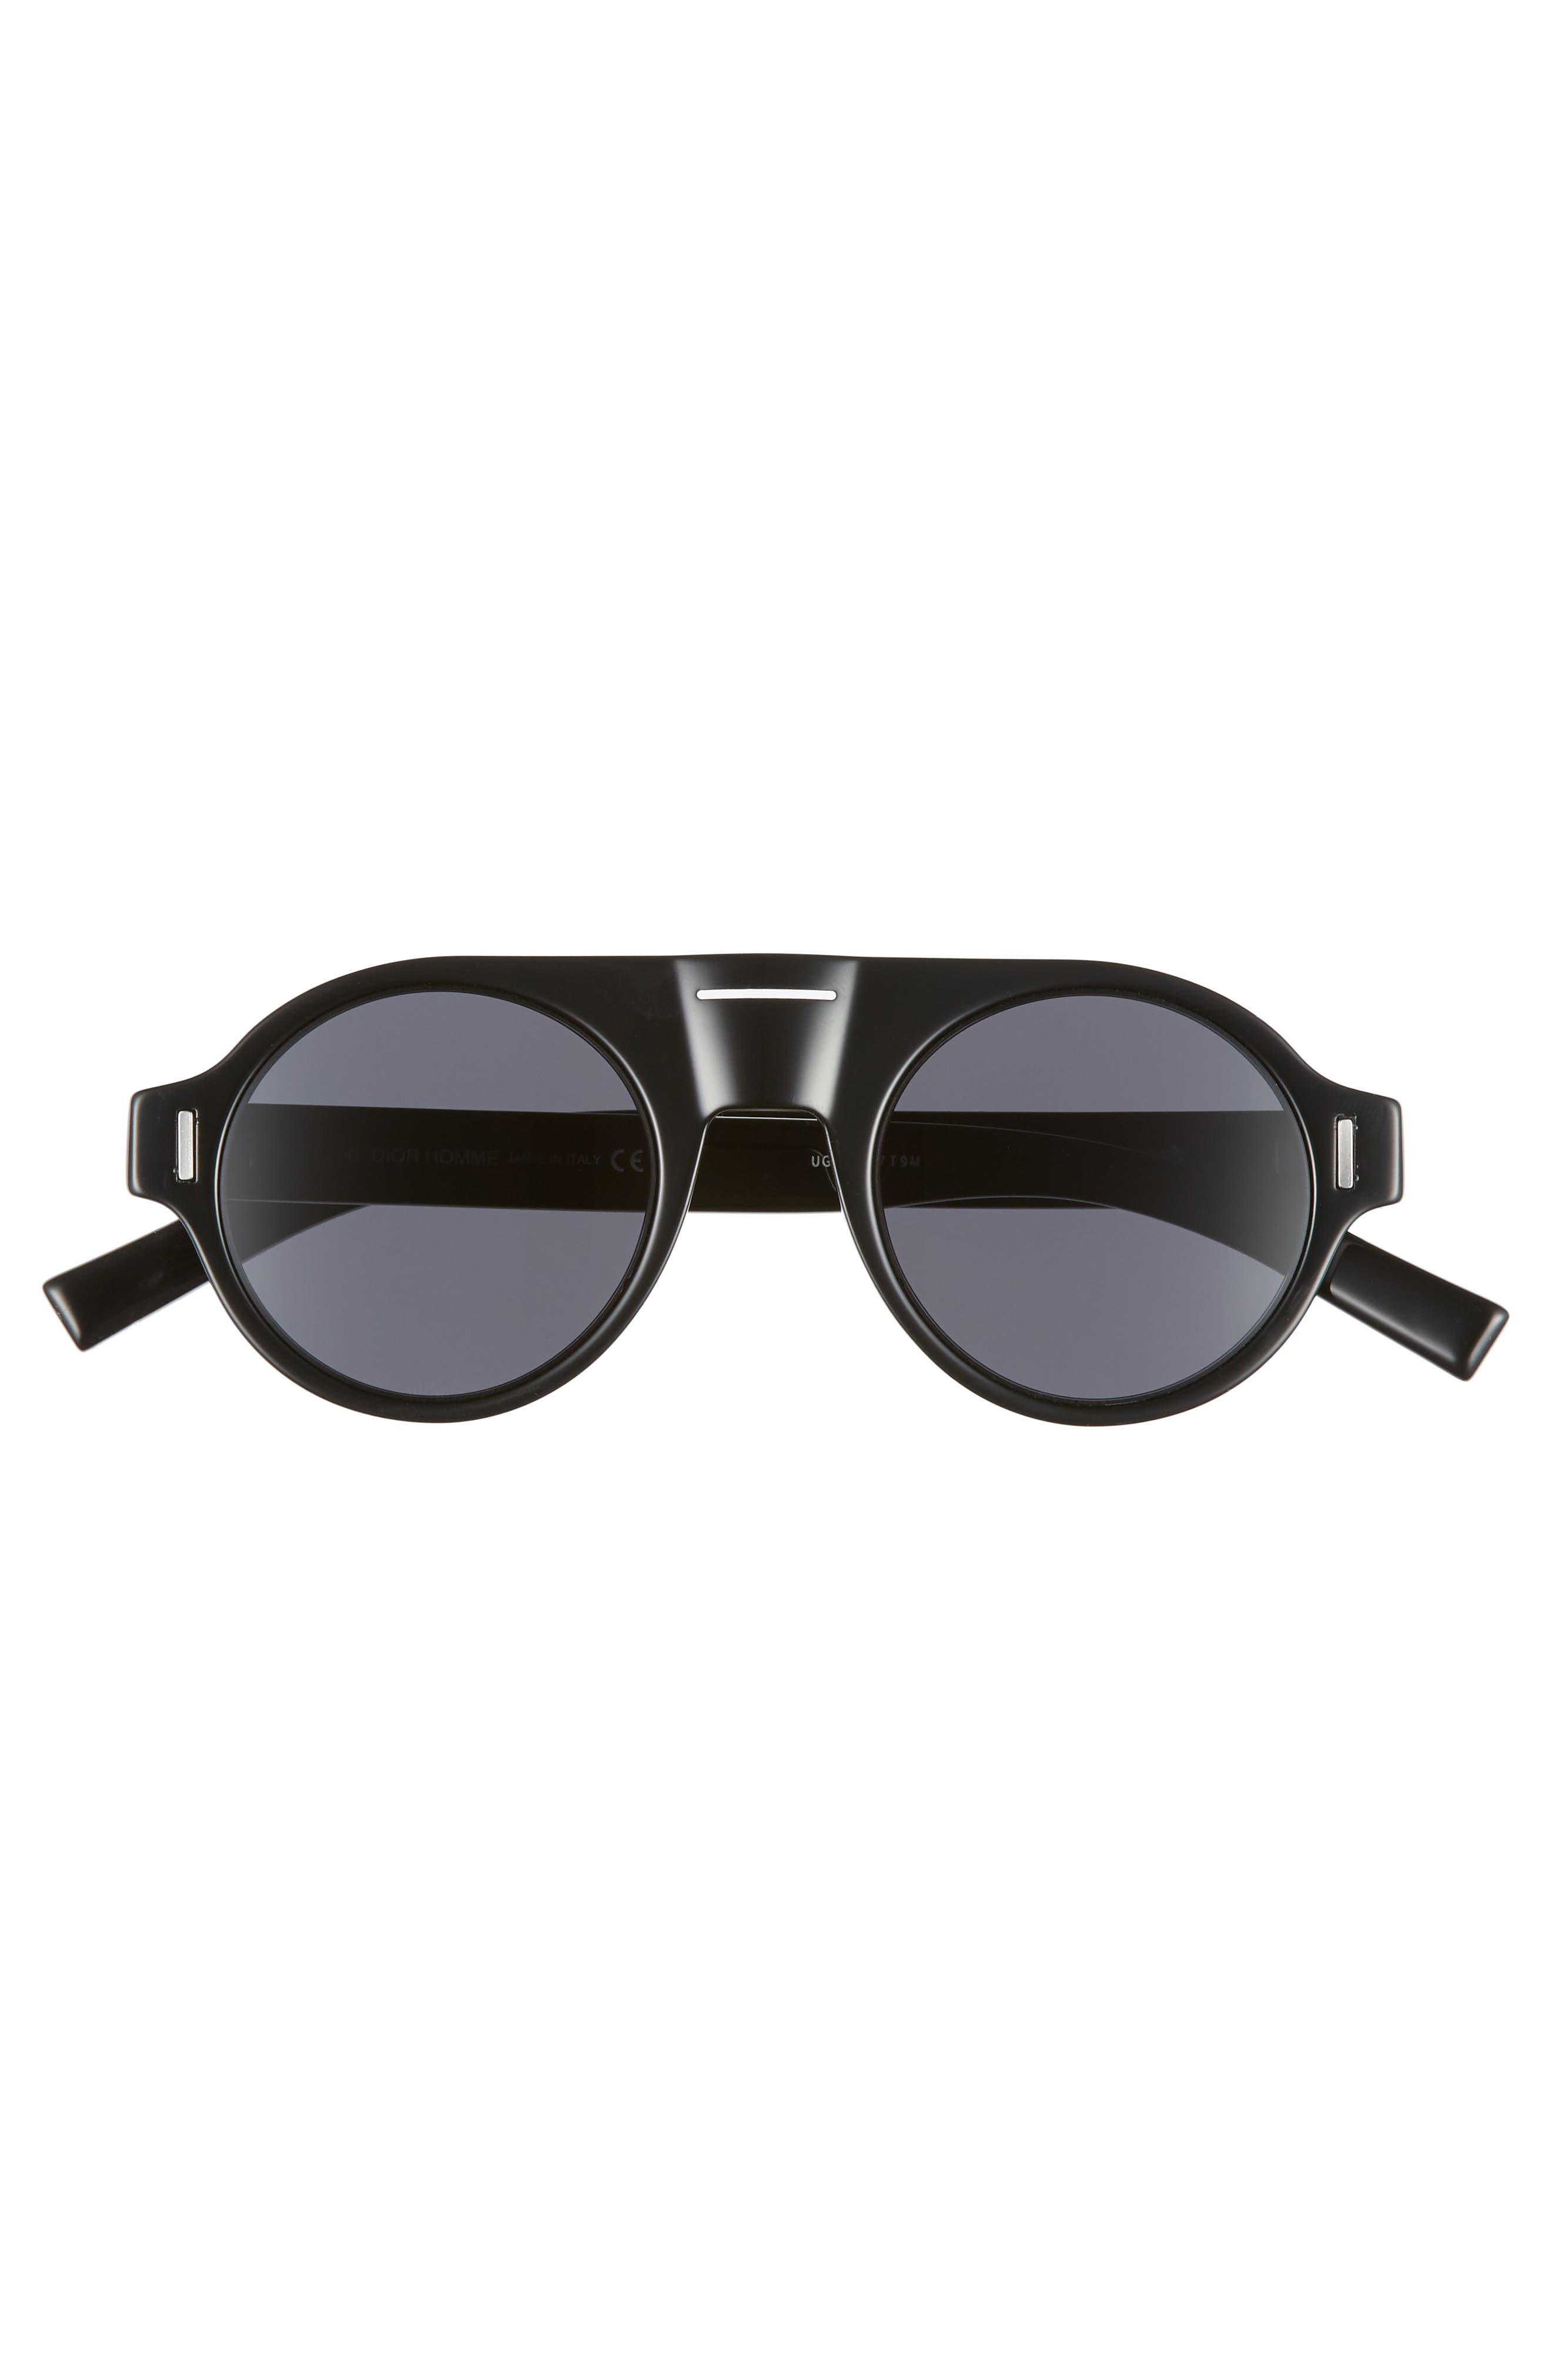 47mm Round Sunglasses,                             Alternate thumbnail 2, color,                             BLACK